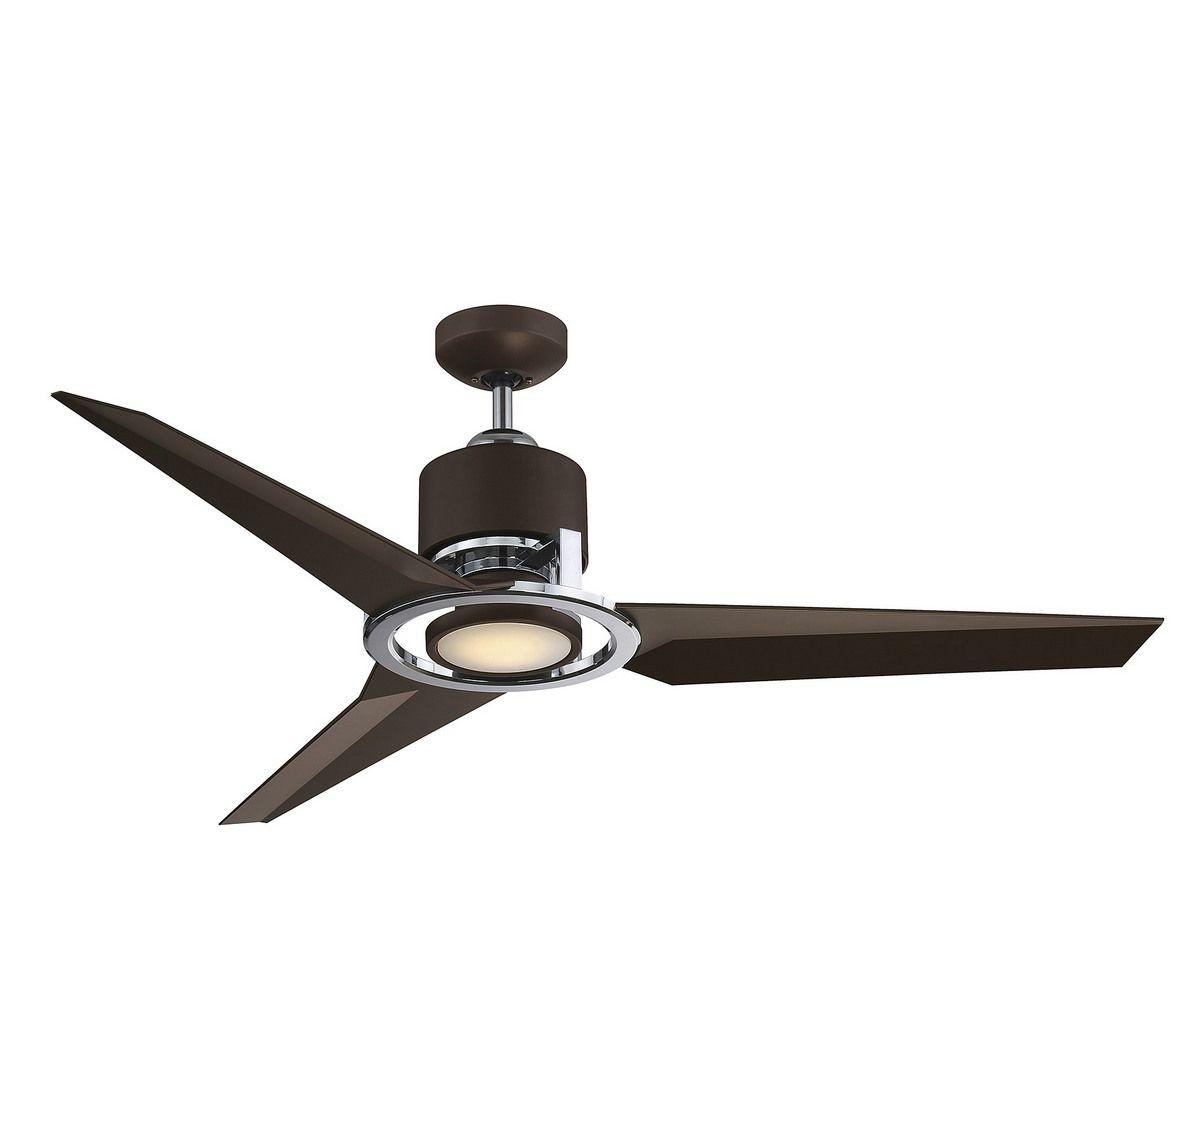 High Resolution Quality Ceiling Fans 5 Chrome Ceiling Fan: Savoy House Starling 3-Blade Ceiling Fan In Metallic